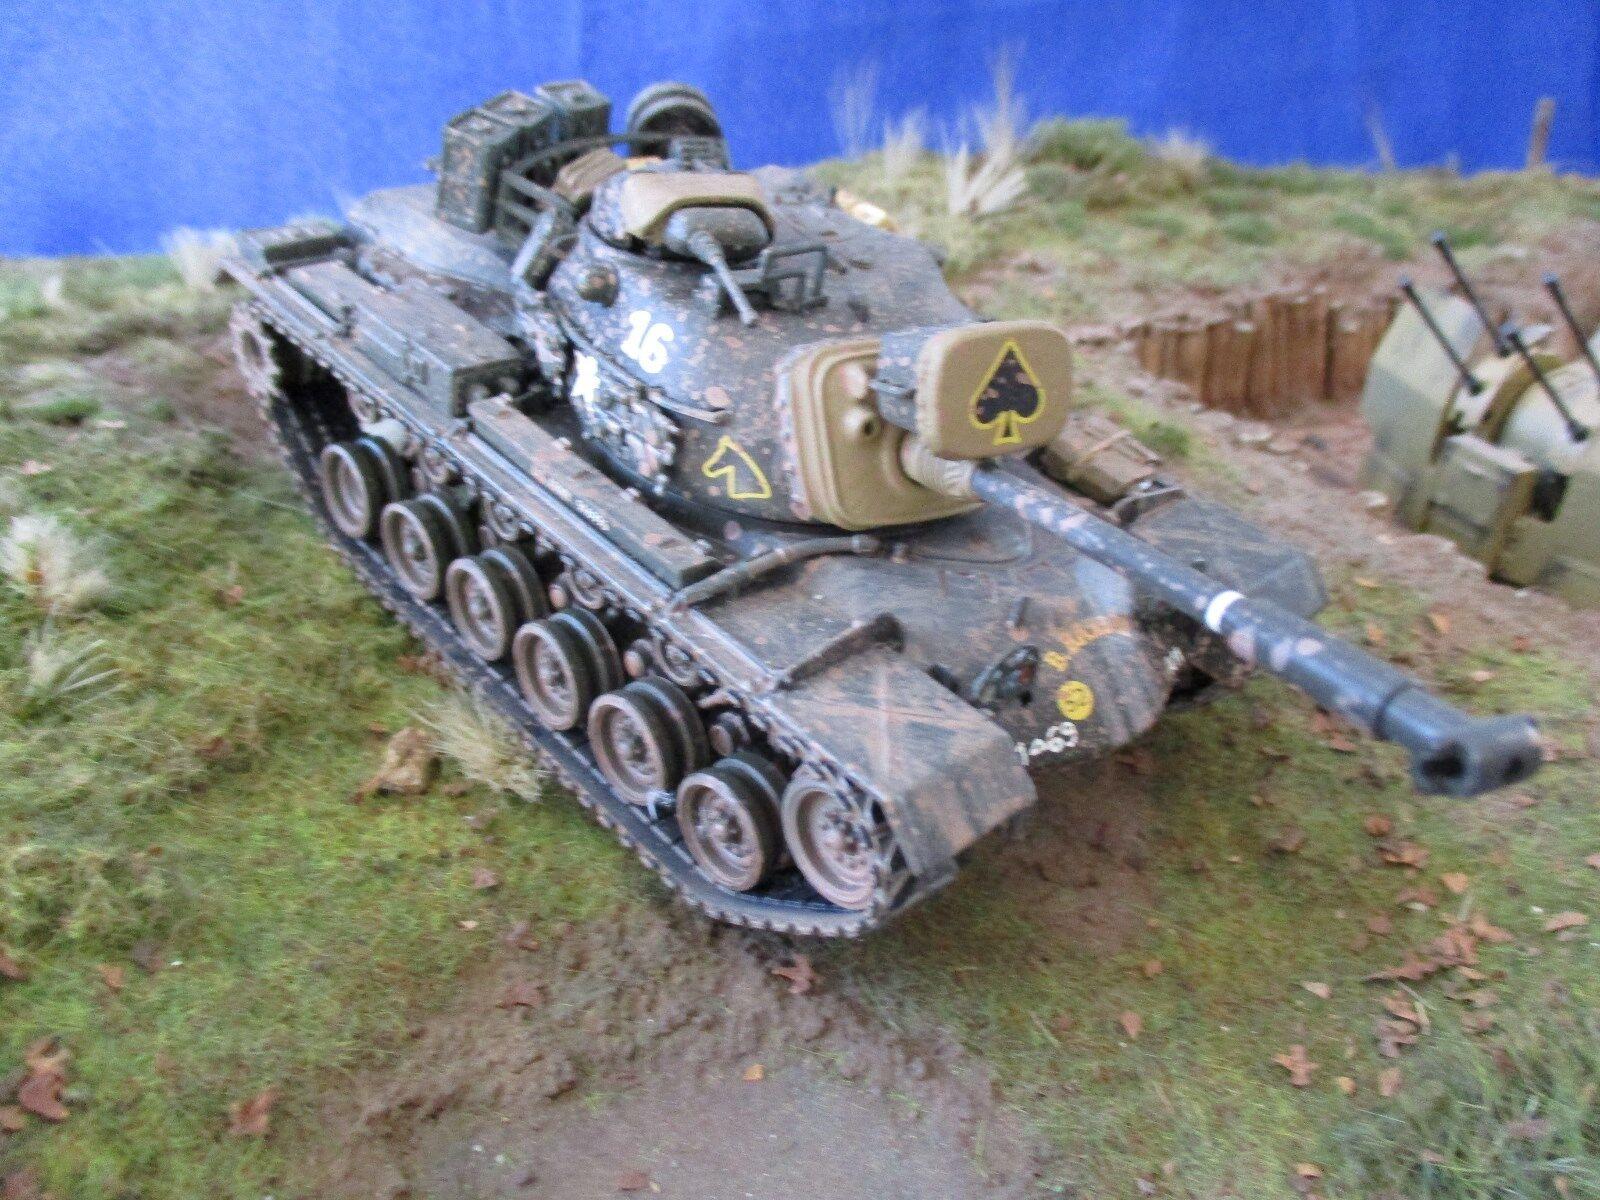 AE614 CORGI SpielzeugS 1 50 M48 A3 PATTON TANK VIETNAM WAR US50305 69th Armor US Army